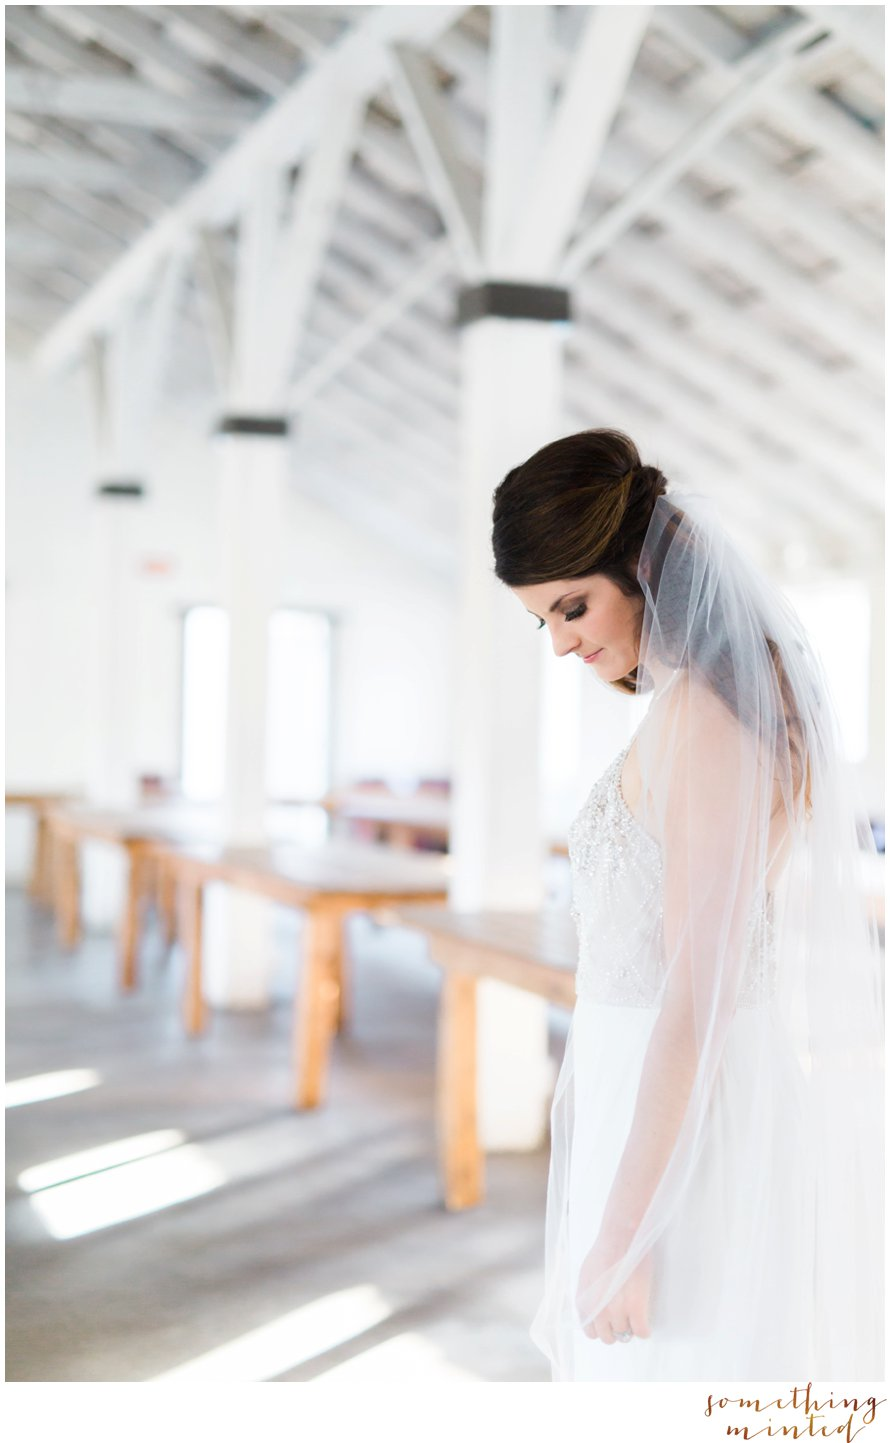 Bridal Portraits by Snohomish Wedding Photographer Something Minted Photography